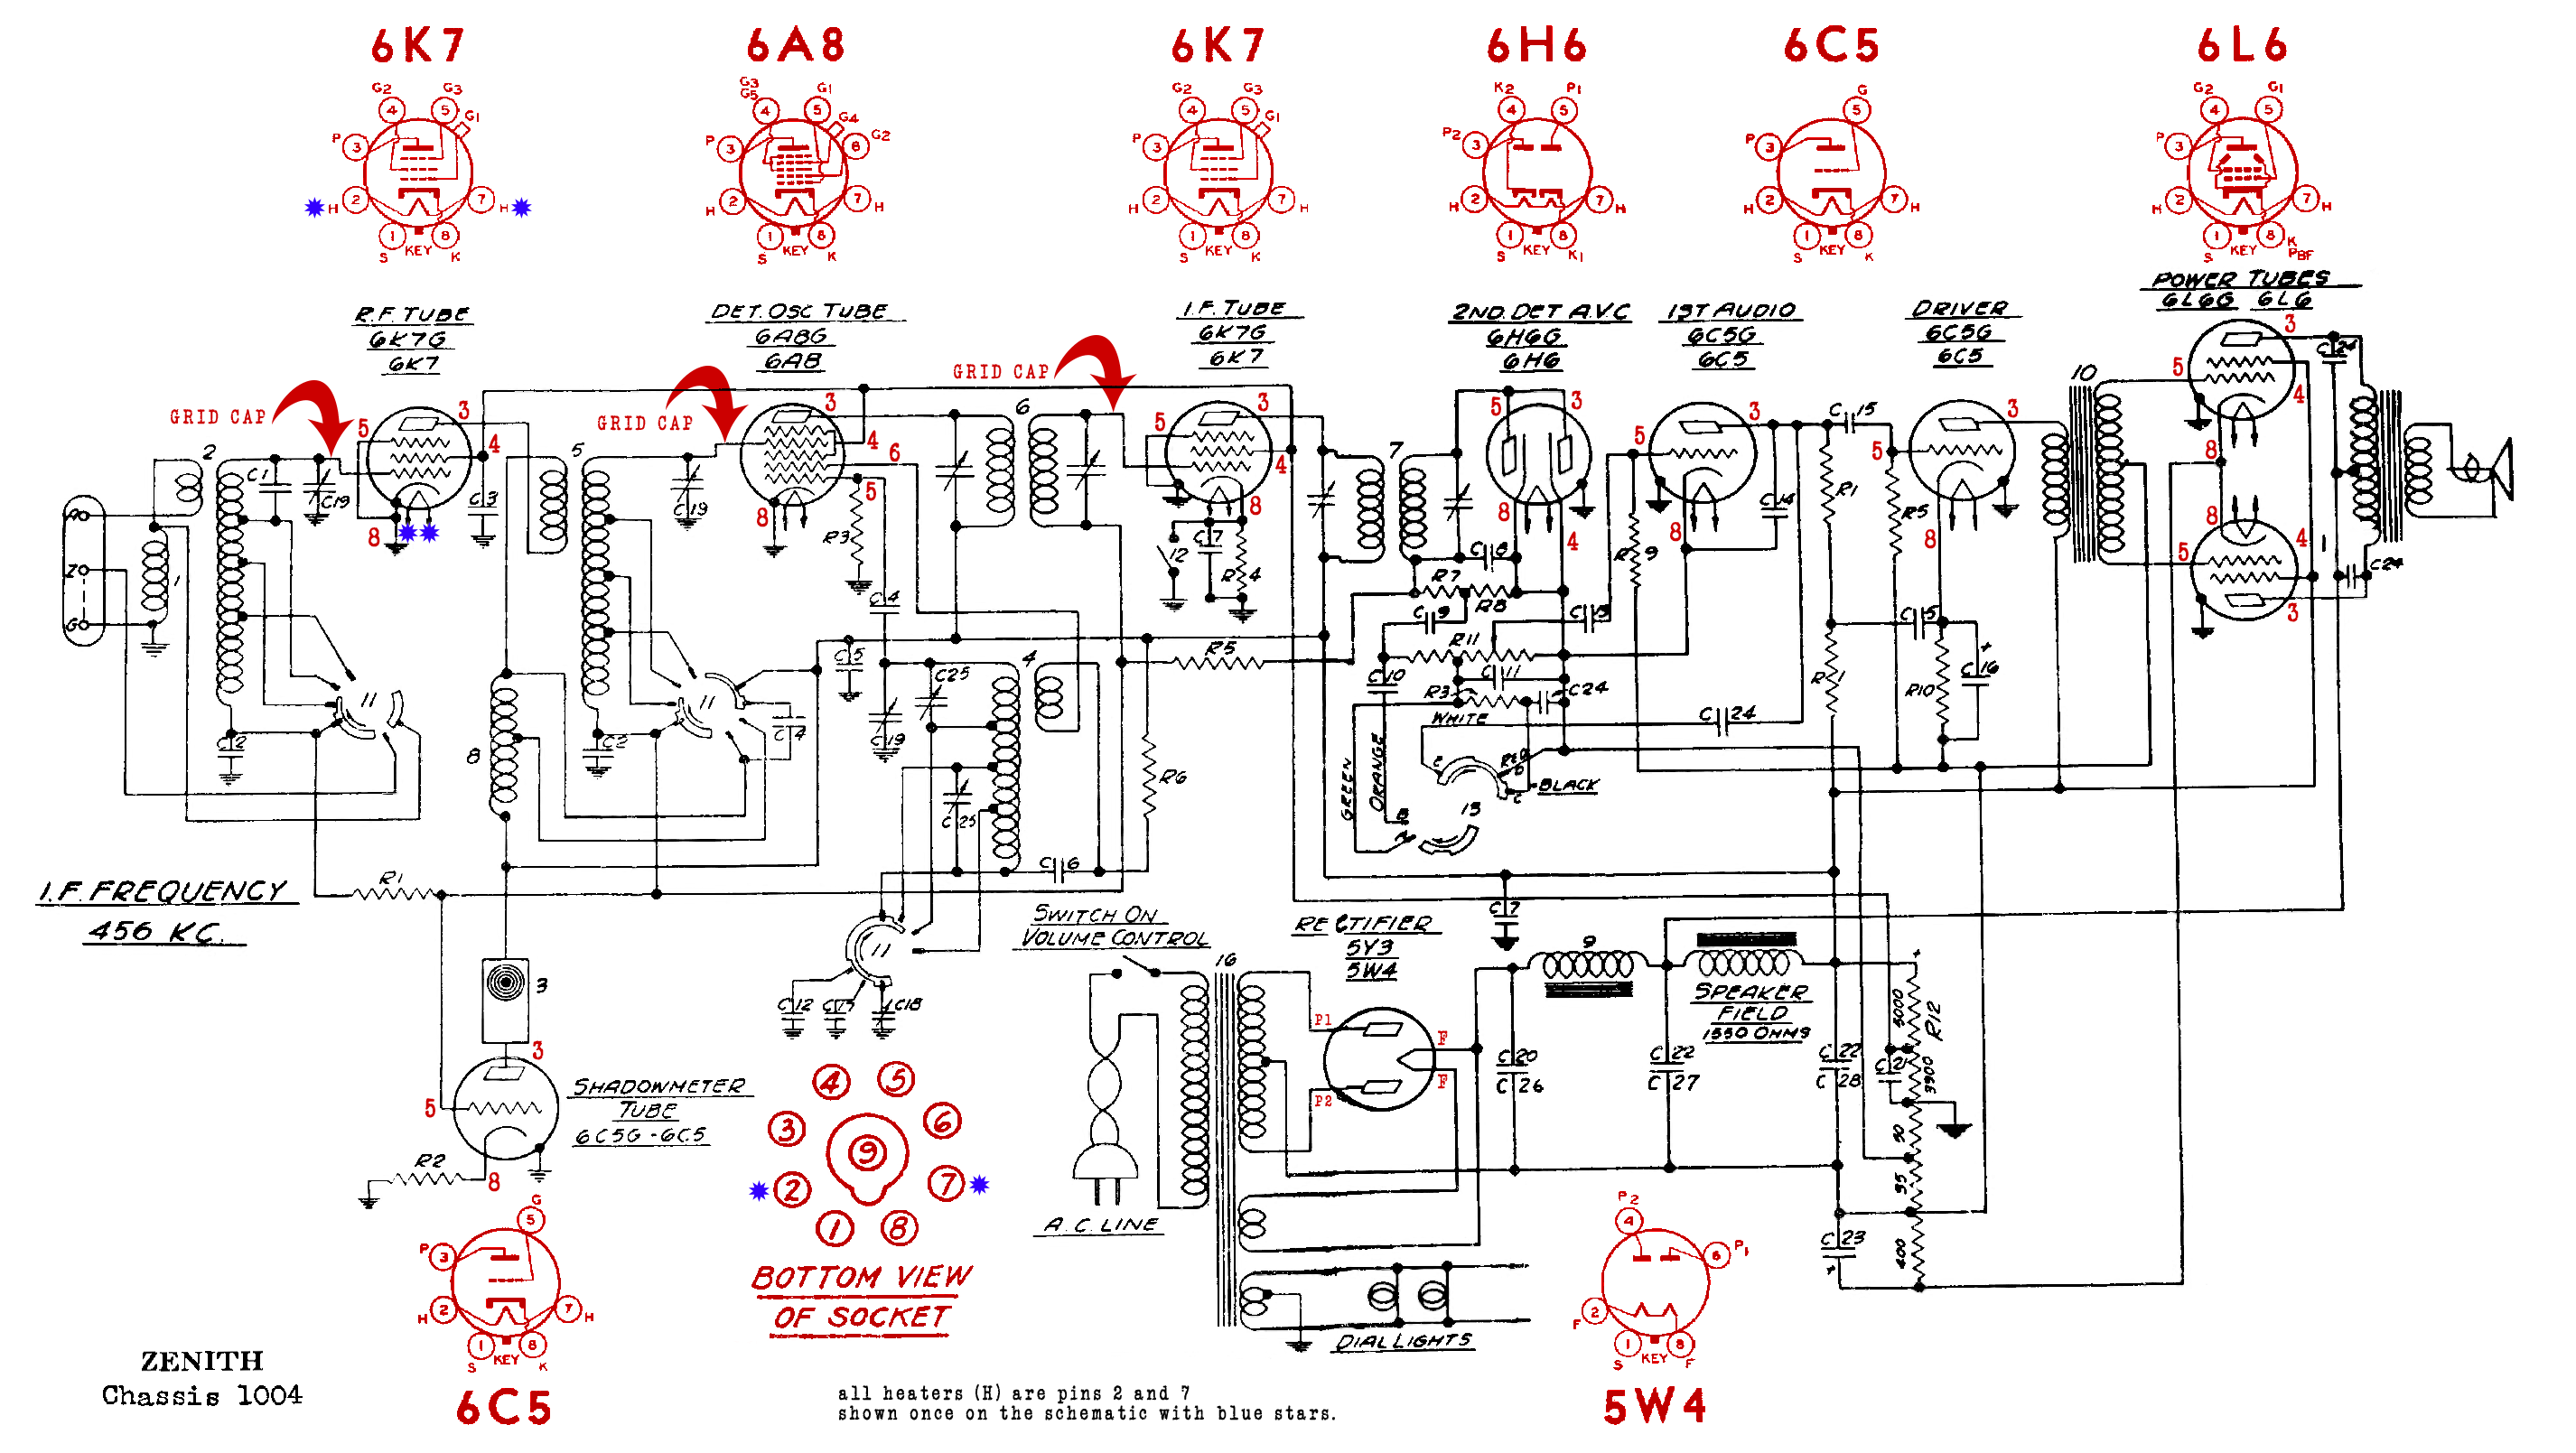 antique radio forums u2022 view topic modern style schematic for rh antiqueradios com Computer Schematic Simple Schematic